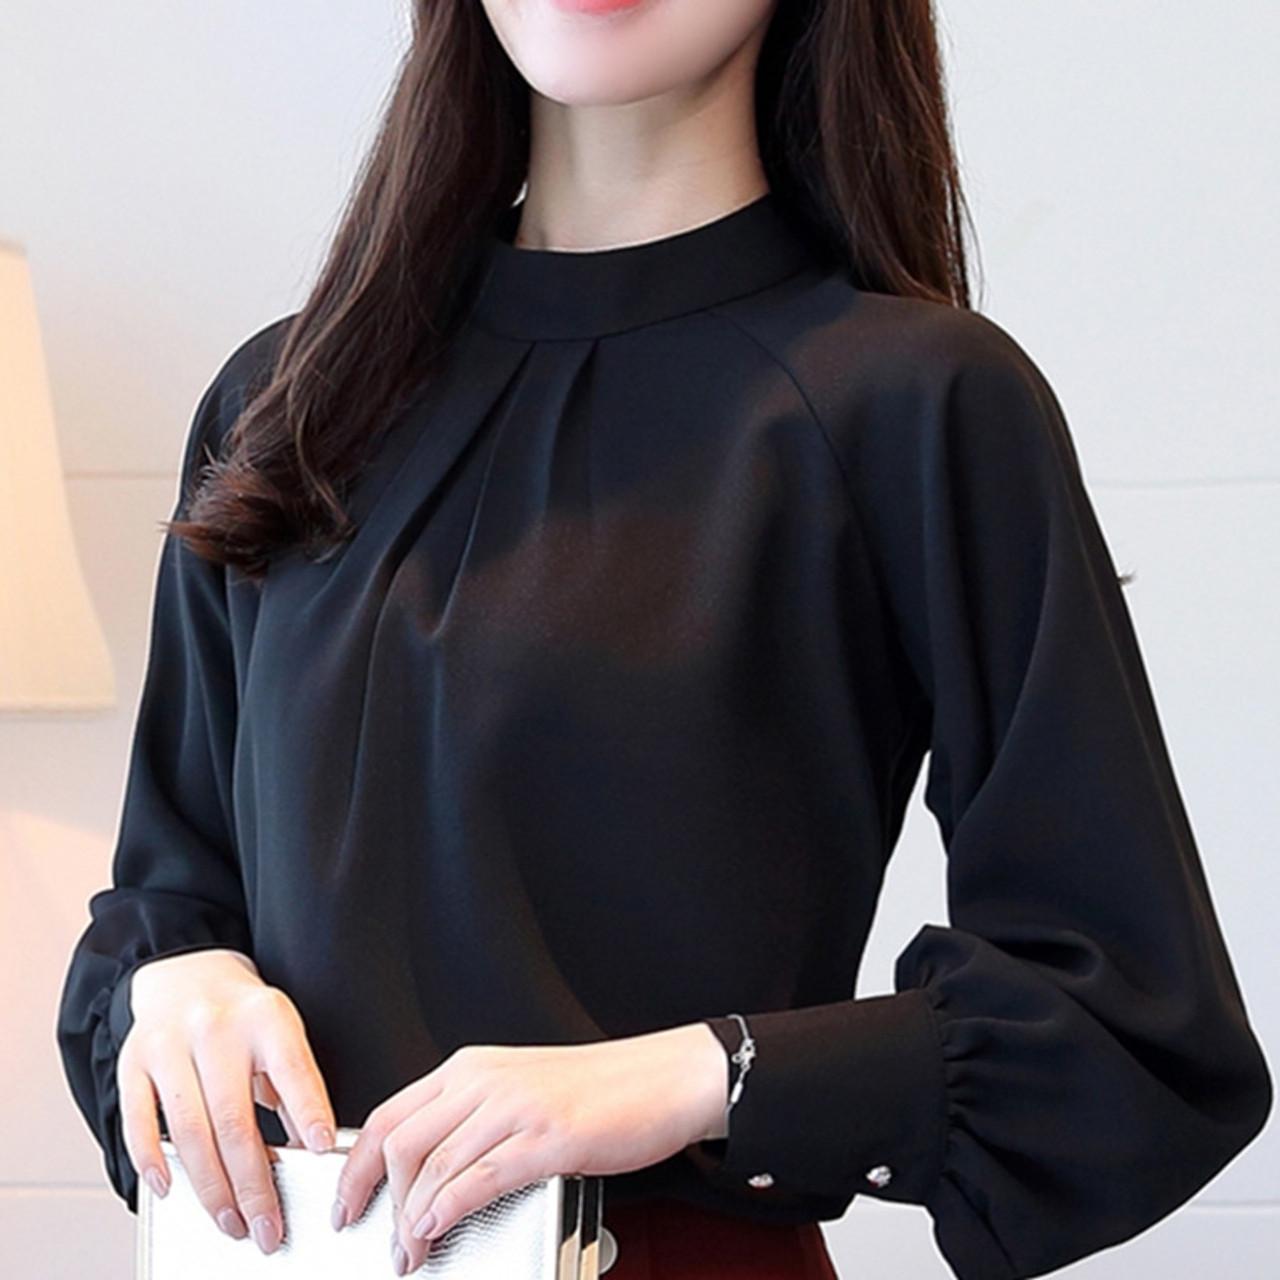 New Autumn 2018 Womens Tops and Blouses Long Sleeve Chiffon Blouse Mujer  Fashion Women Shirts Ladies Tops Shirt Camisa Feminina - OnshopDeals.Com